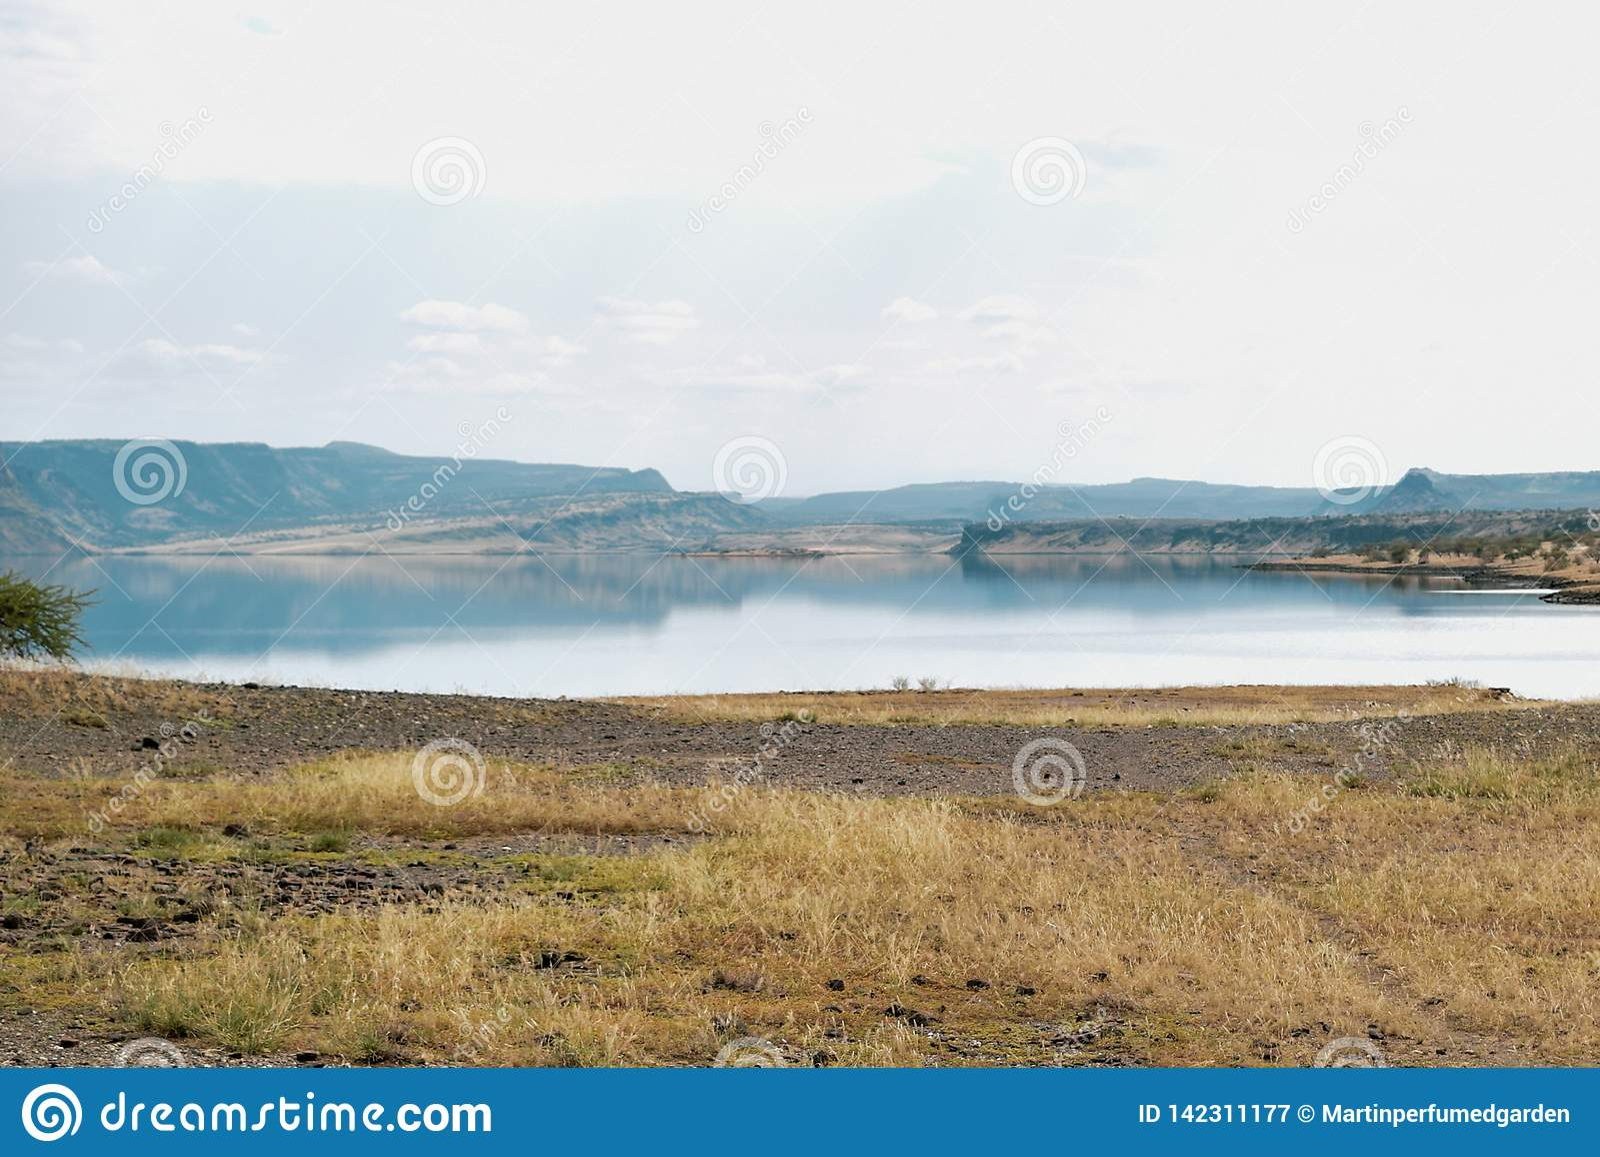 Lake against an arid landscape